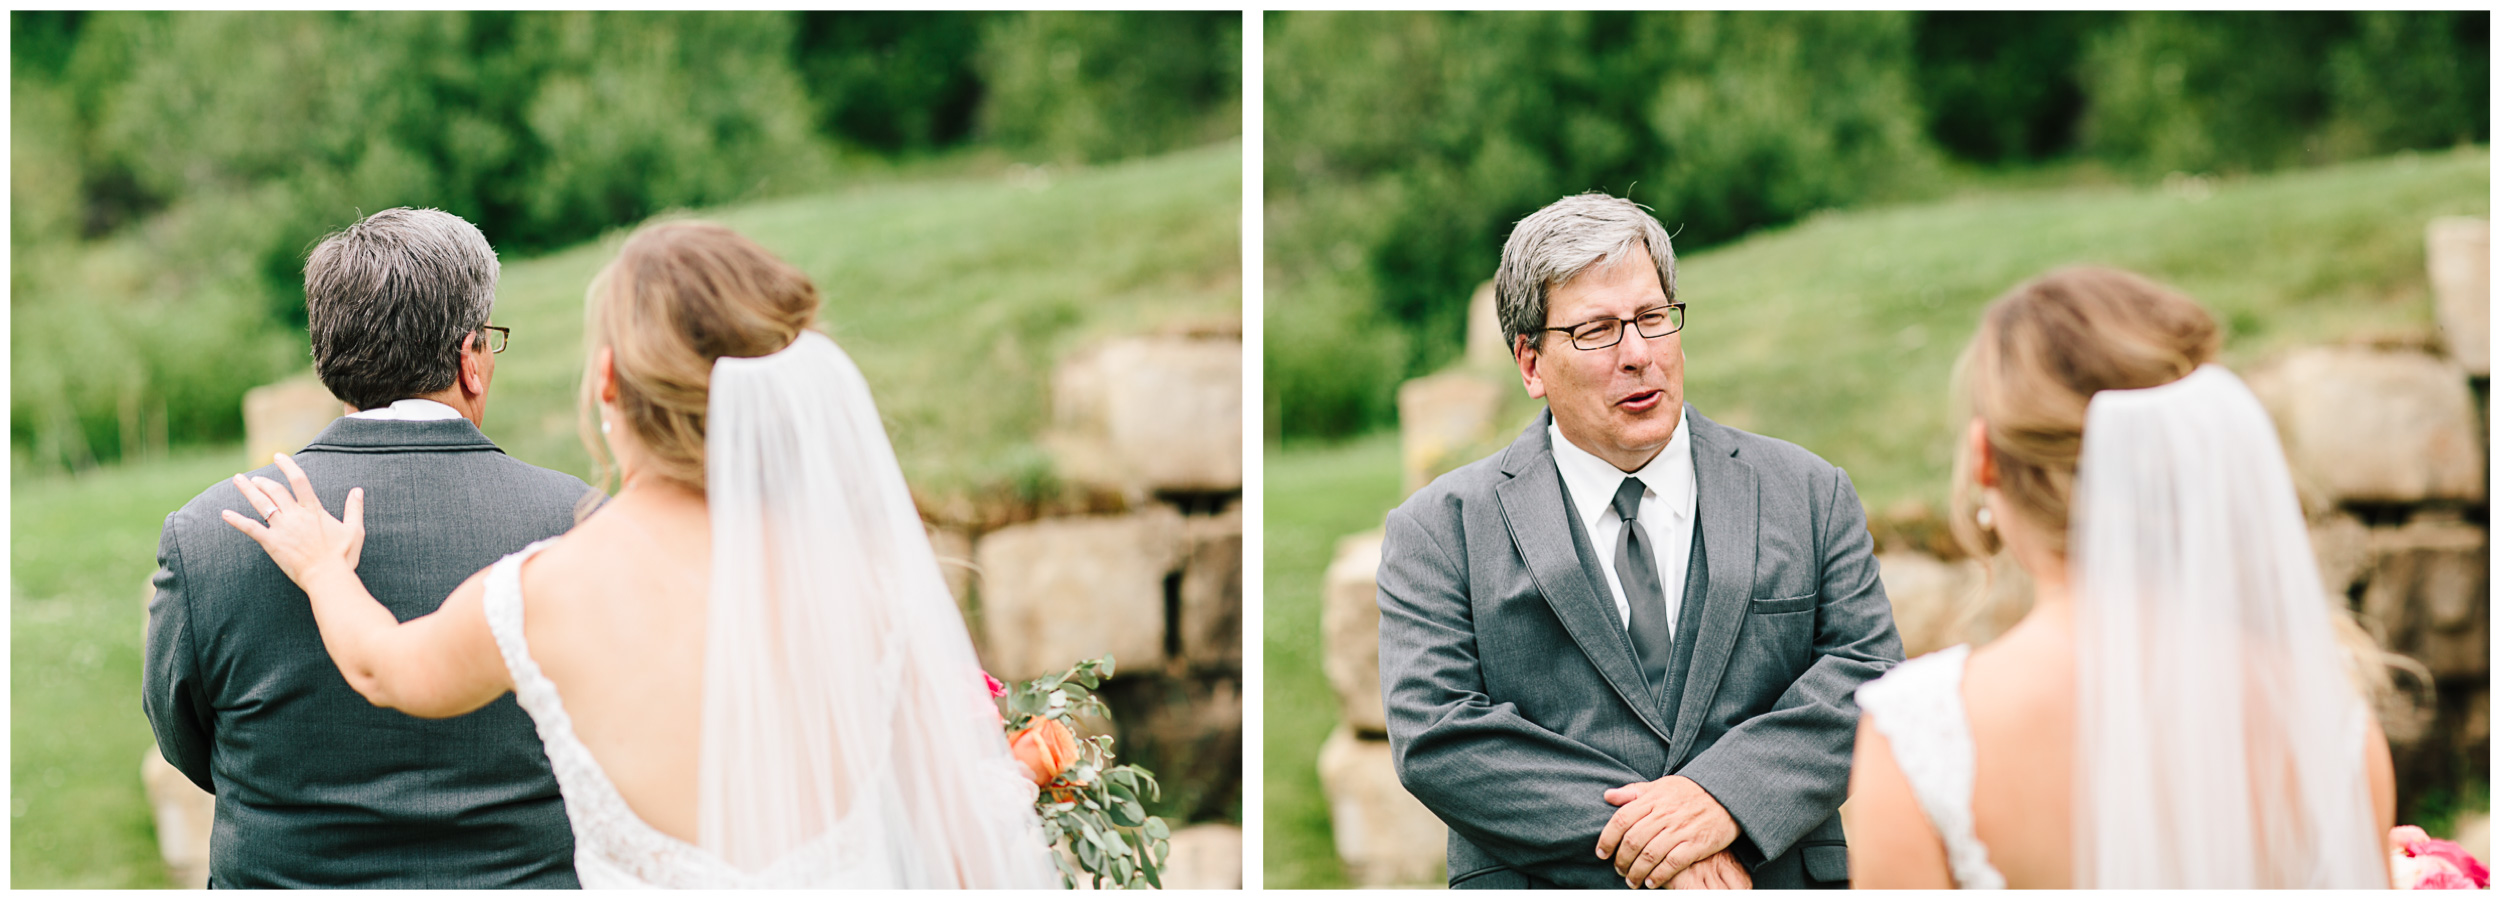 redlodge_montana_wedding_16.jpg